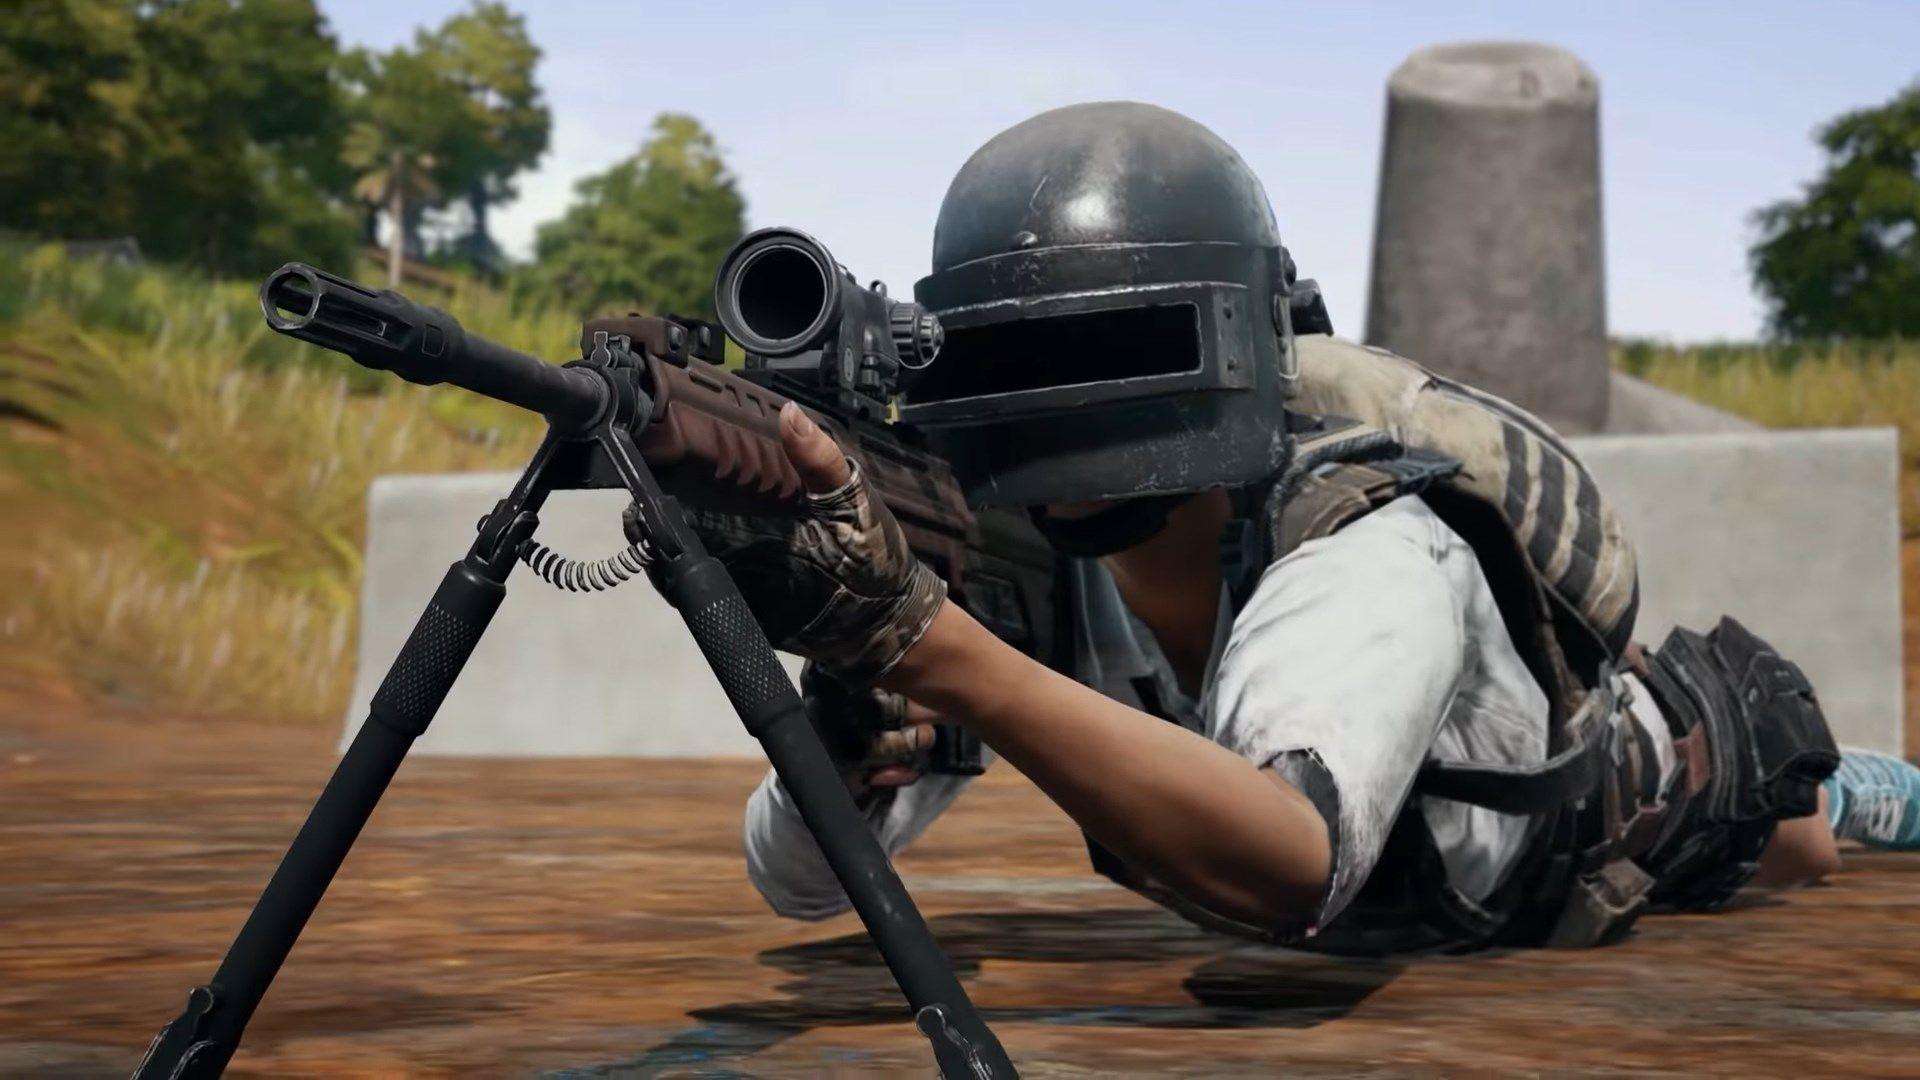 Pubg Sniper Photos Wallpaper Download High Resolution 4k